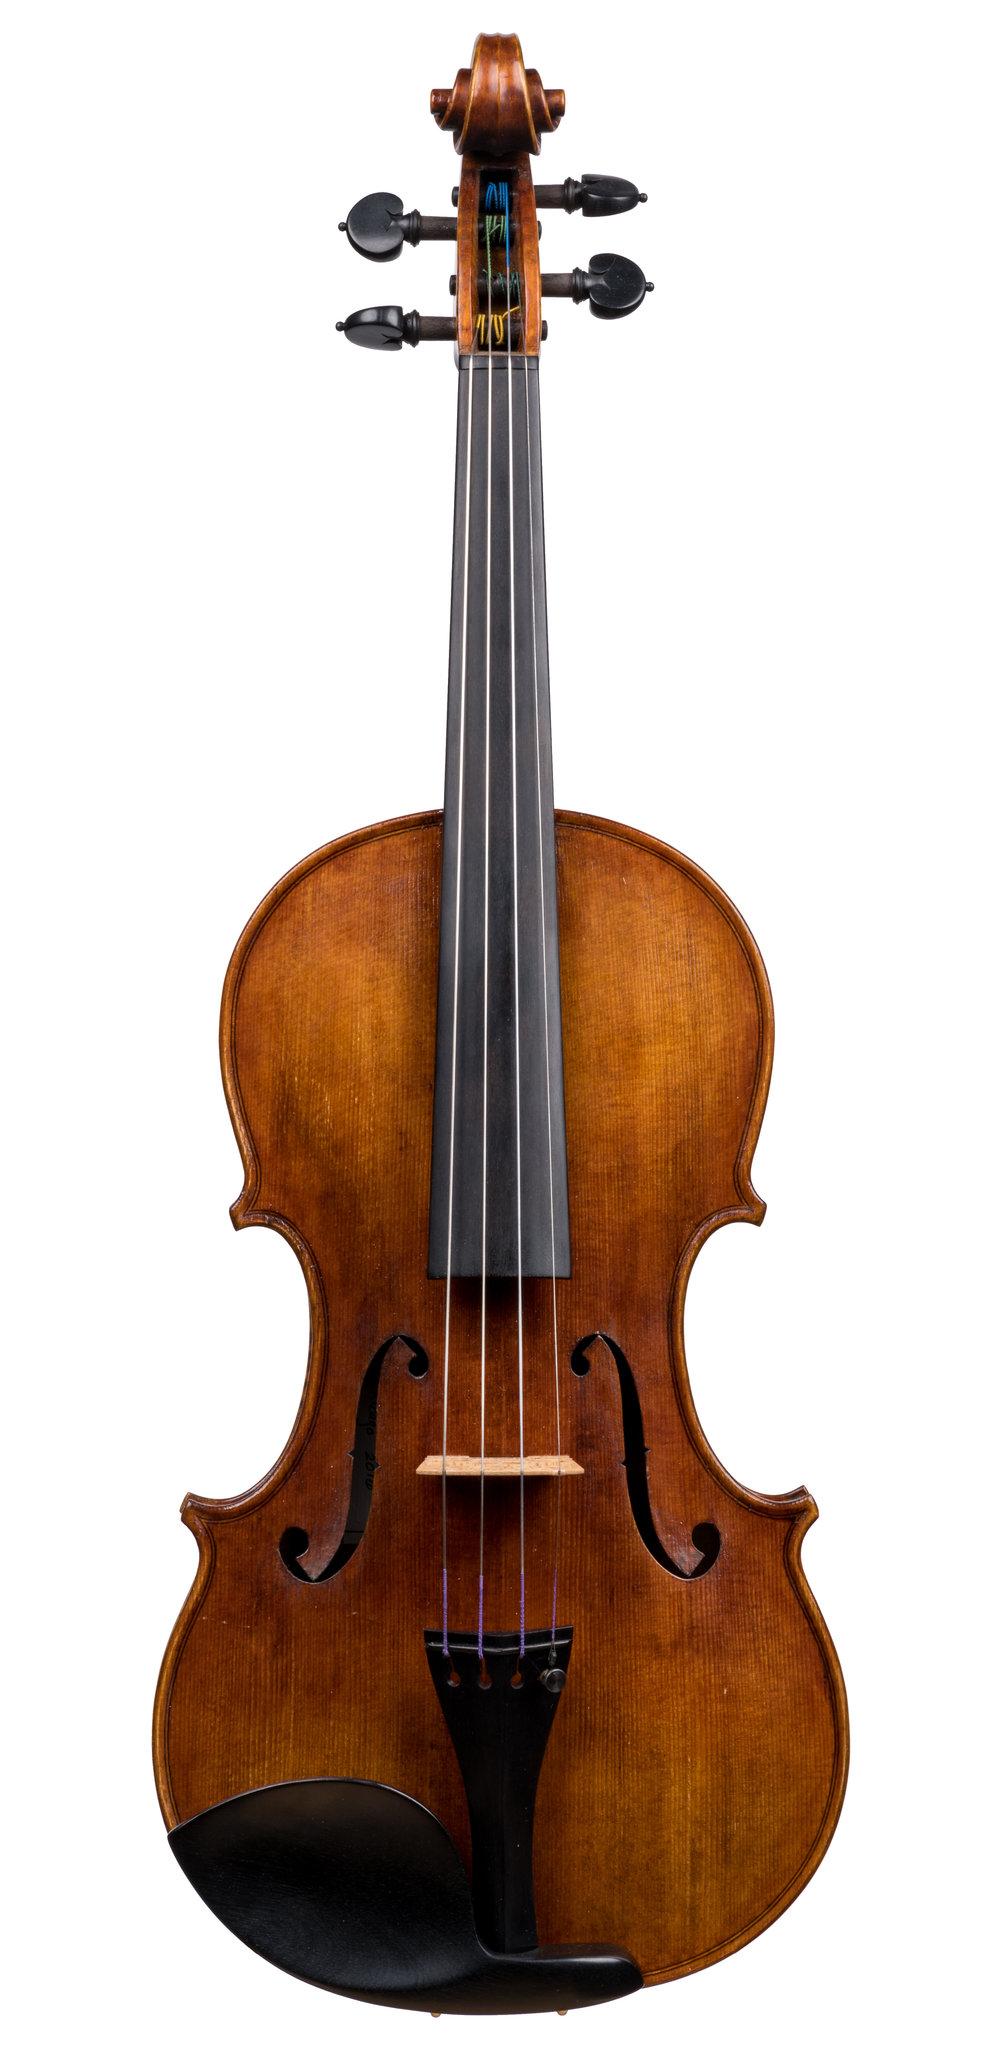 Kristin Siegfried violin, Chicago, 2016 -